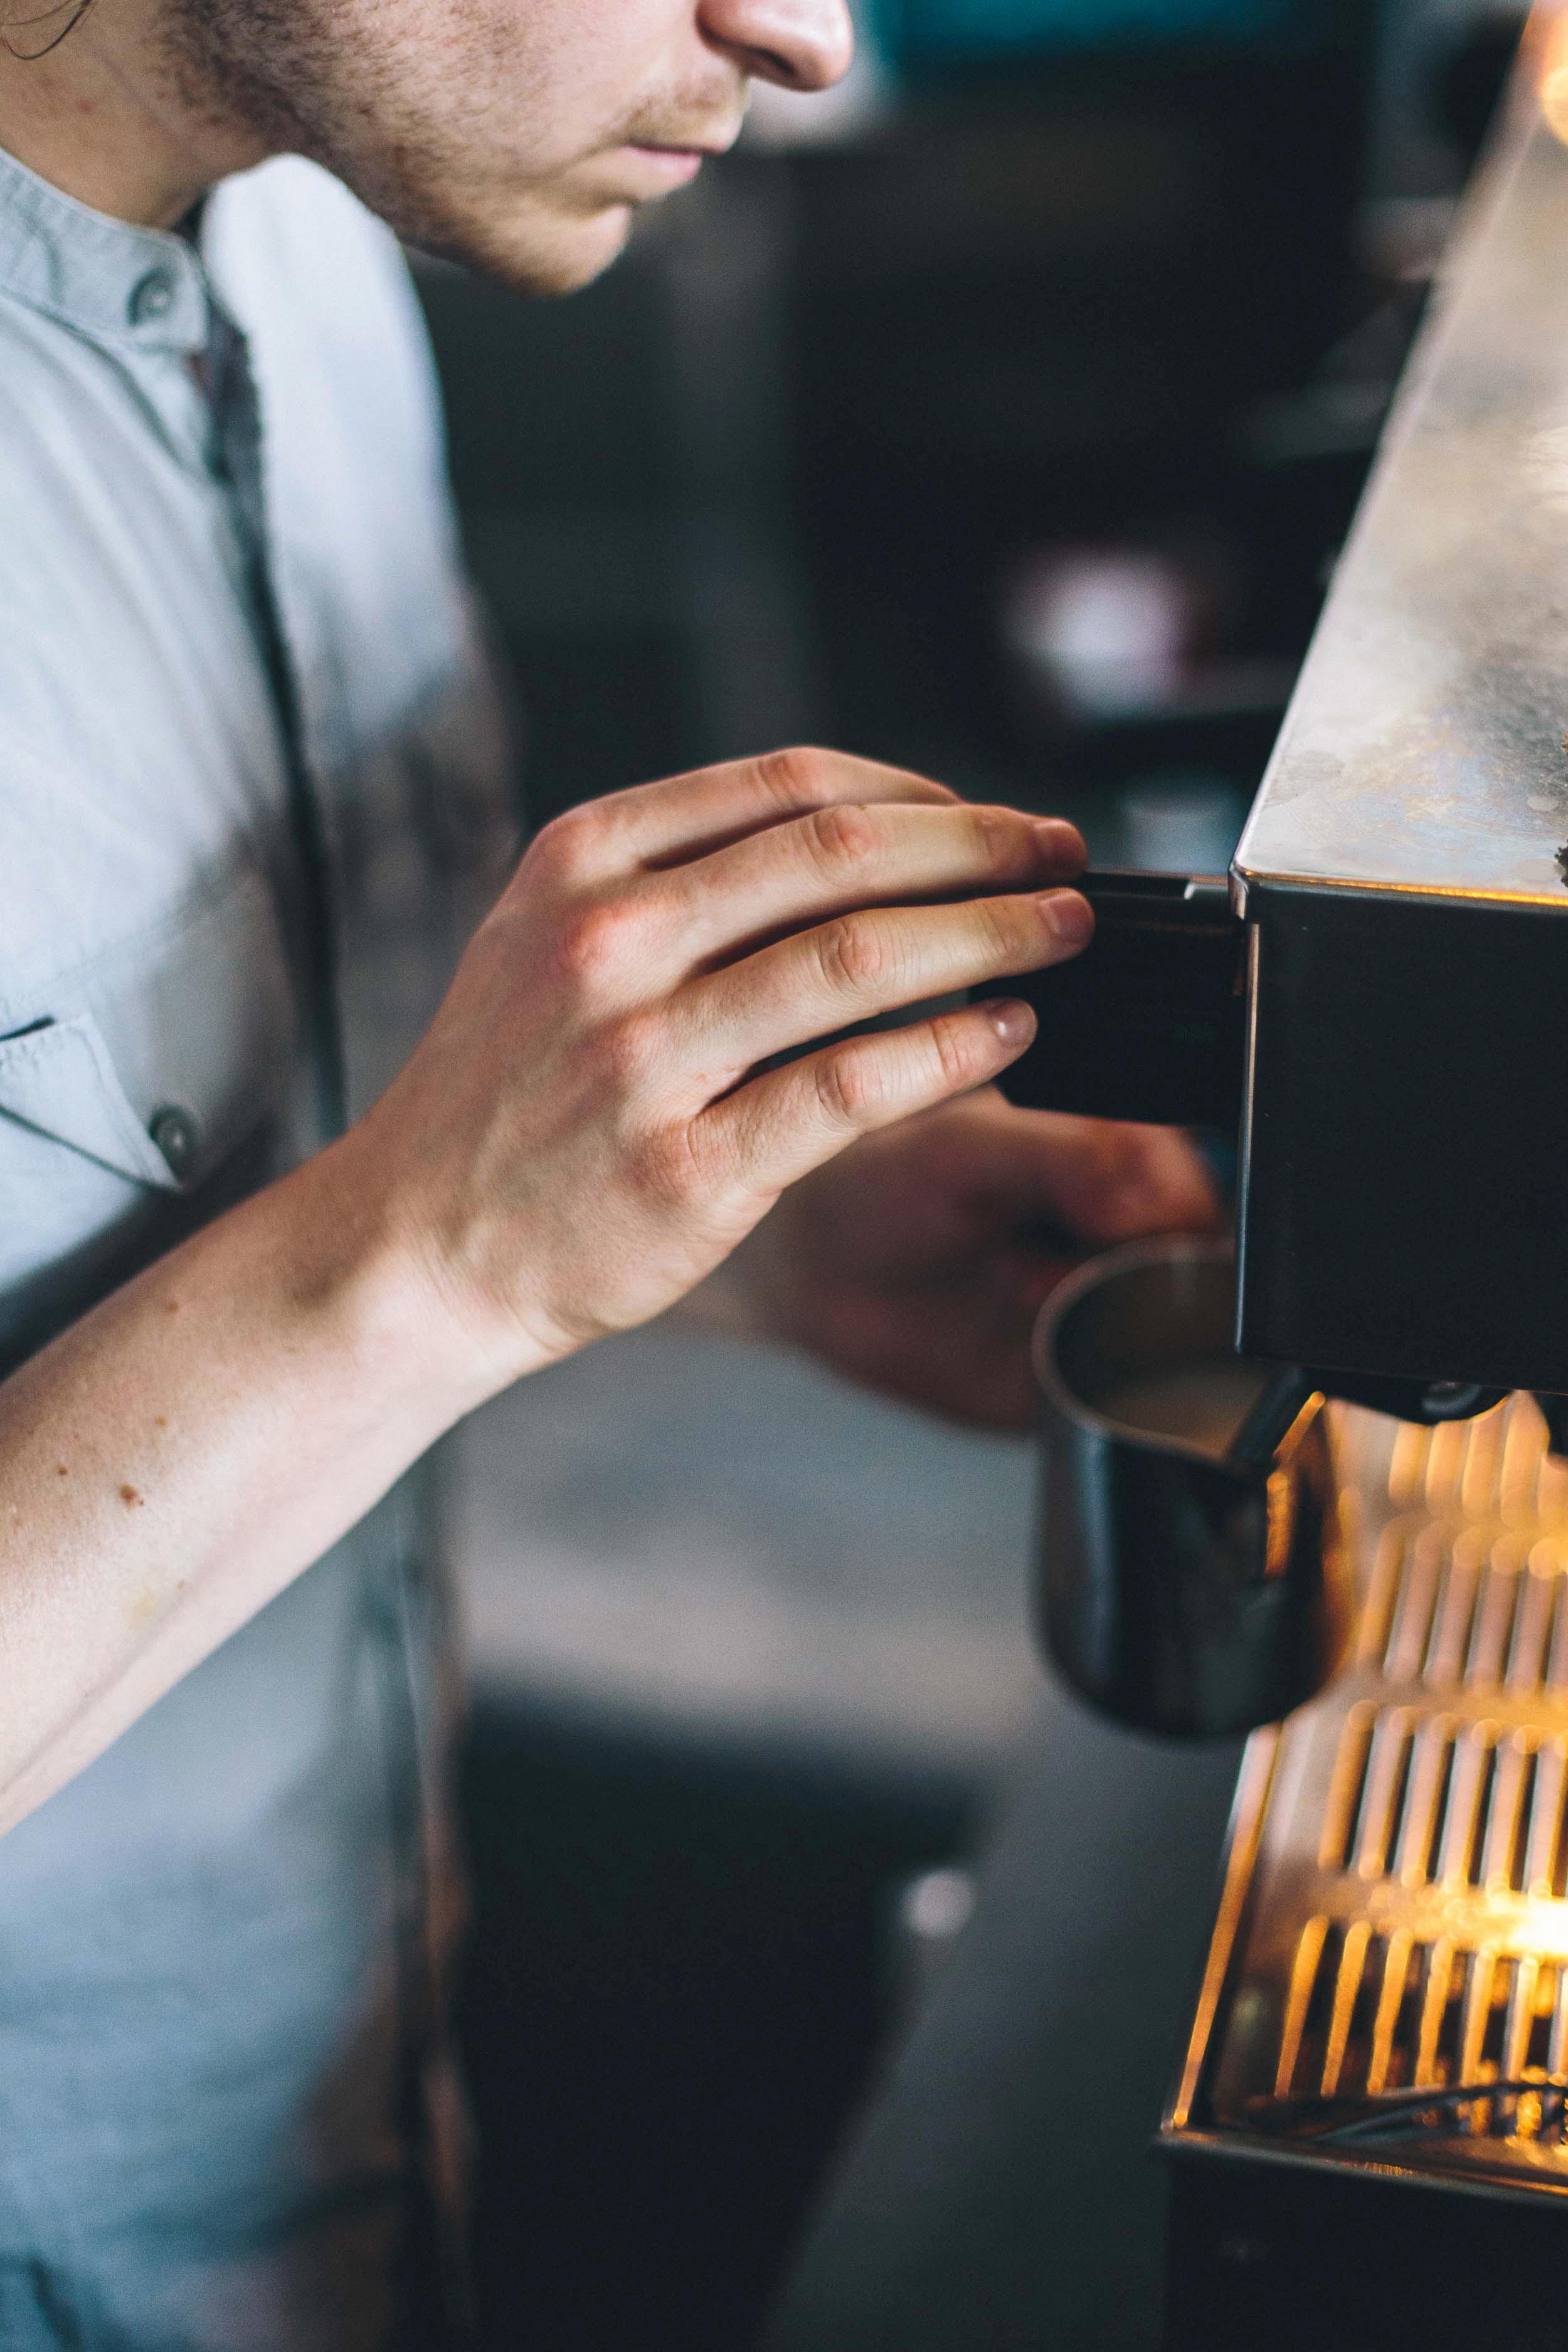 jimmy-rowalt-atlanta-coffee-food-drink-photography-067.jpg